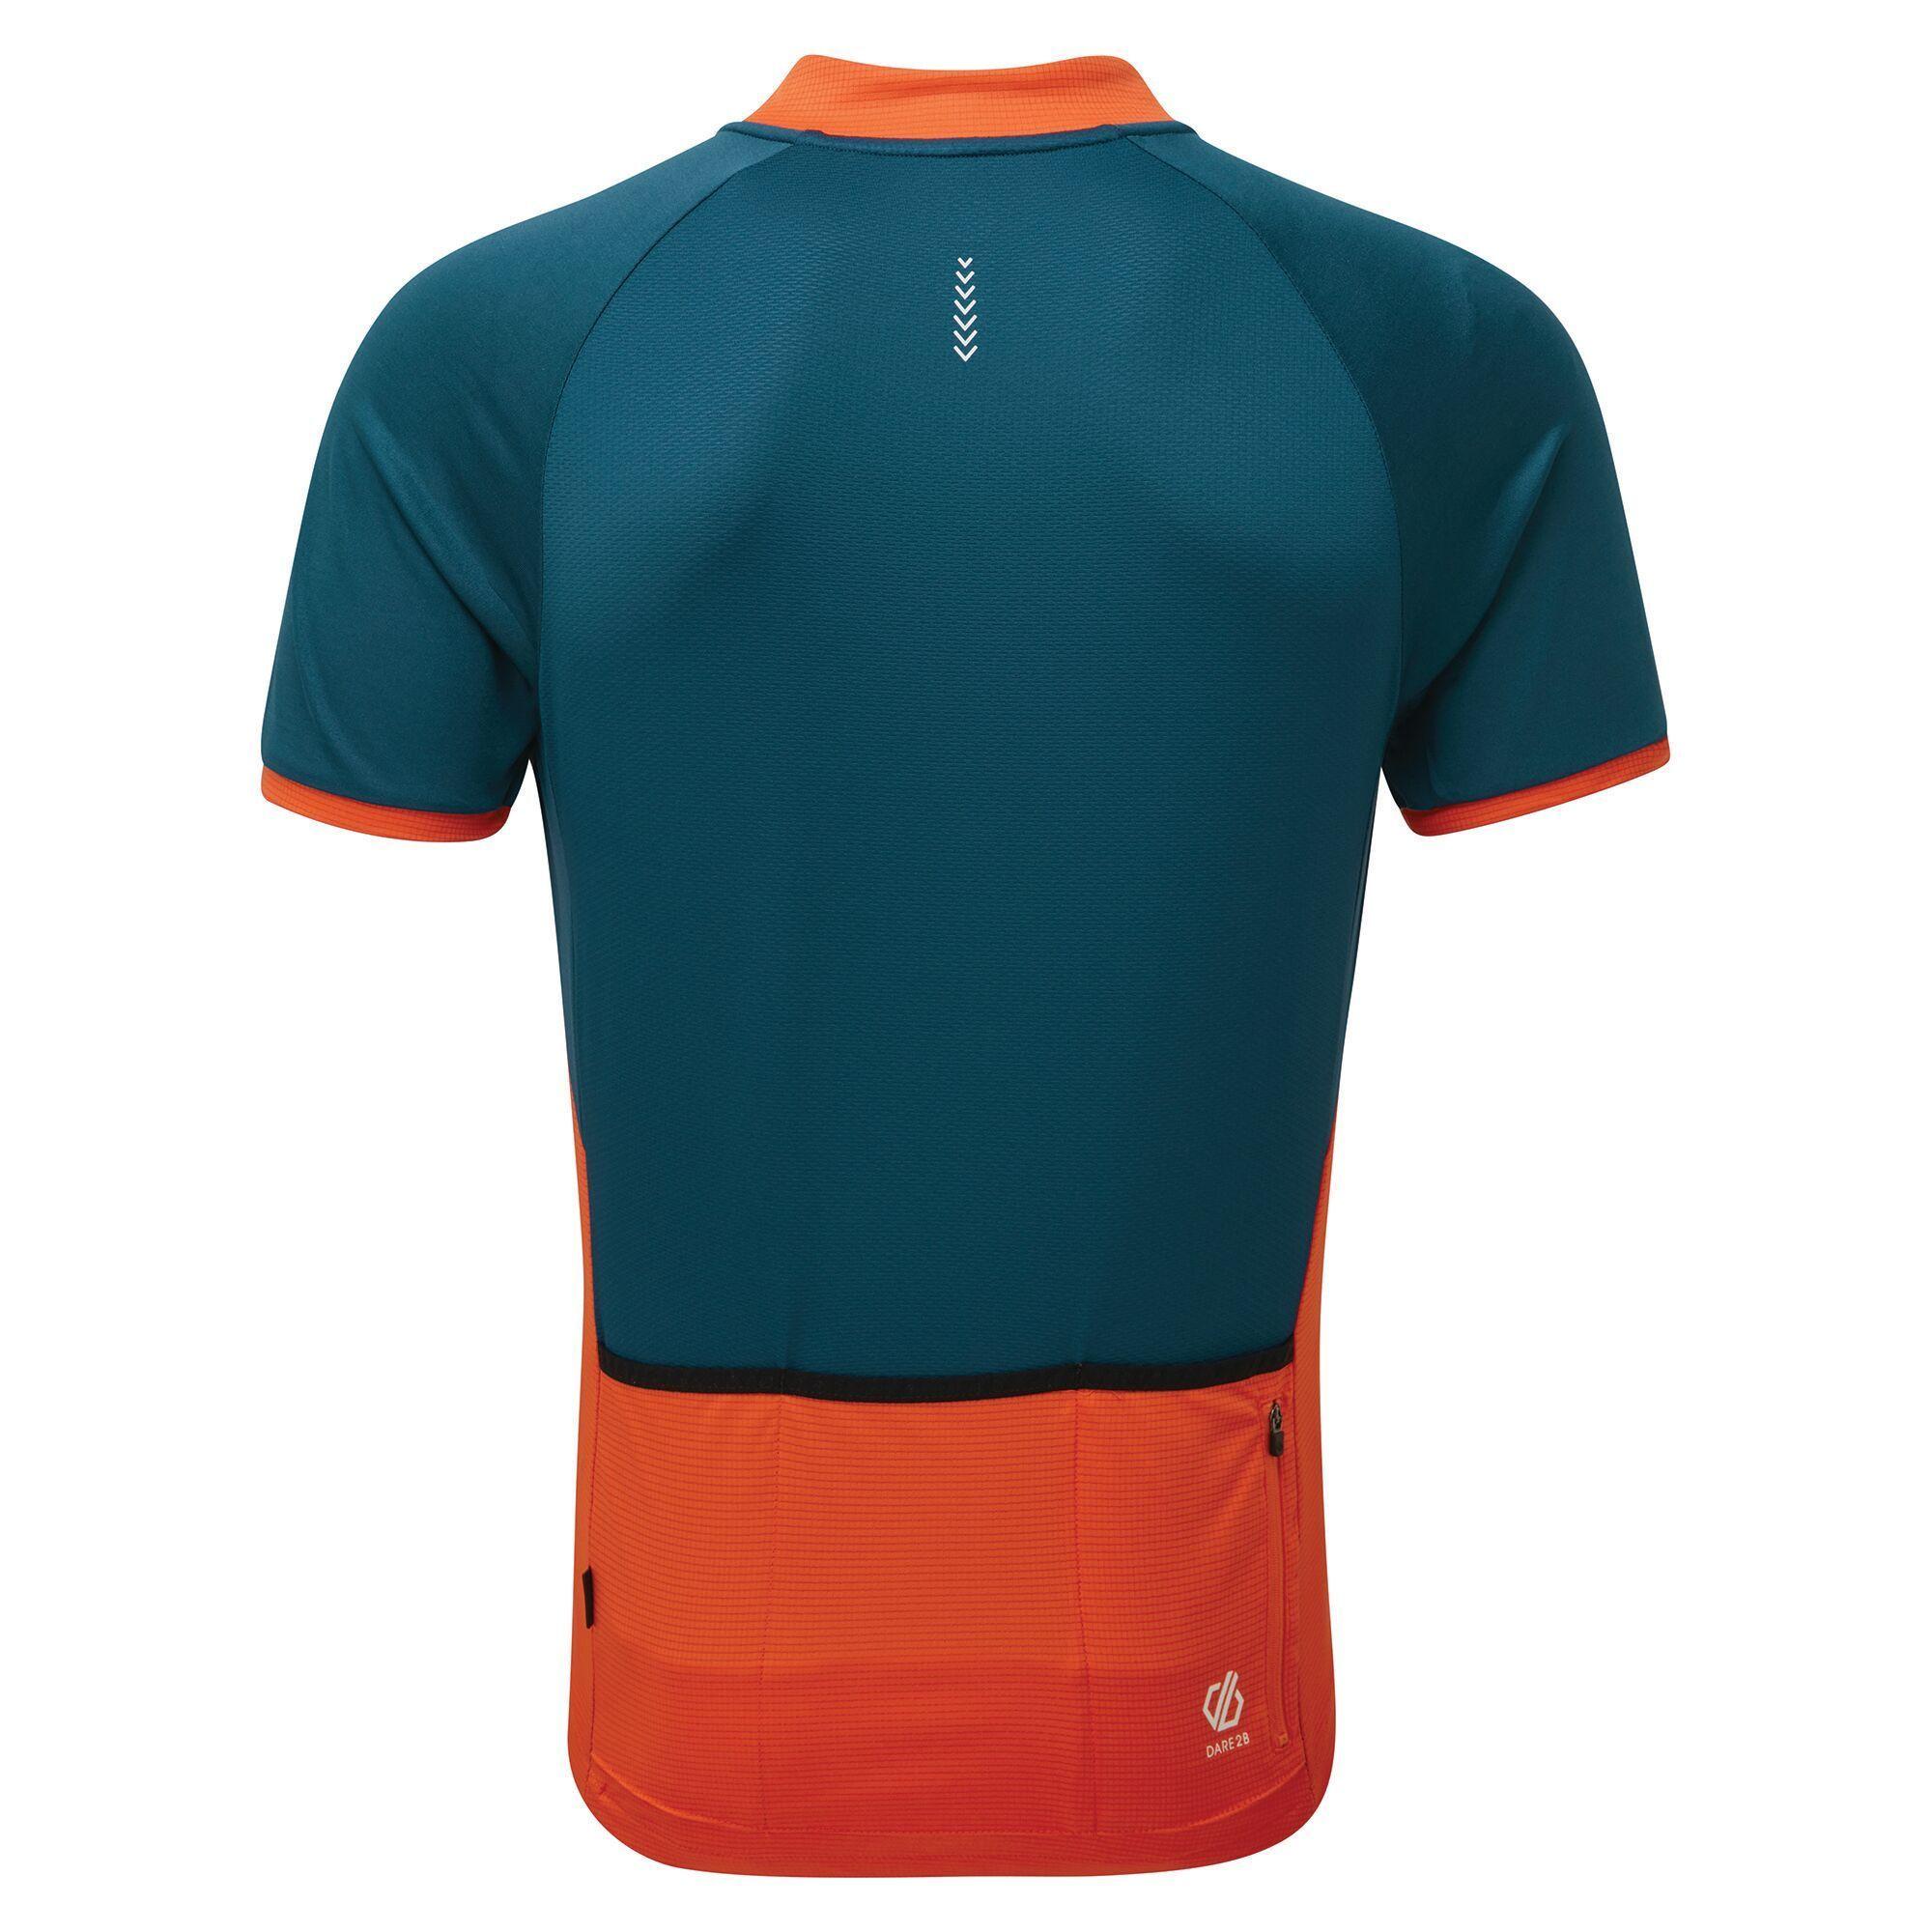 Dare 2B Mens Accurate II Full Zip Cycling Jersey